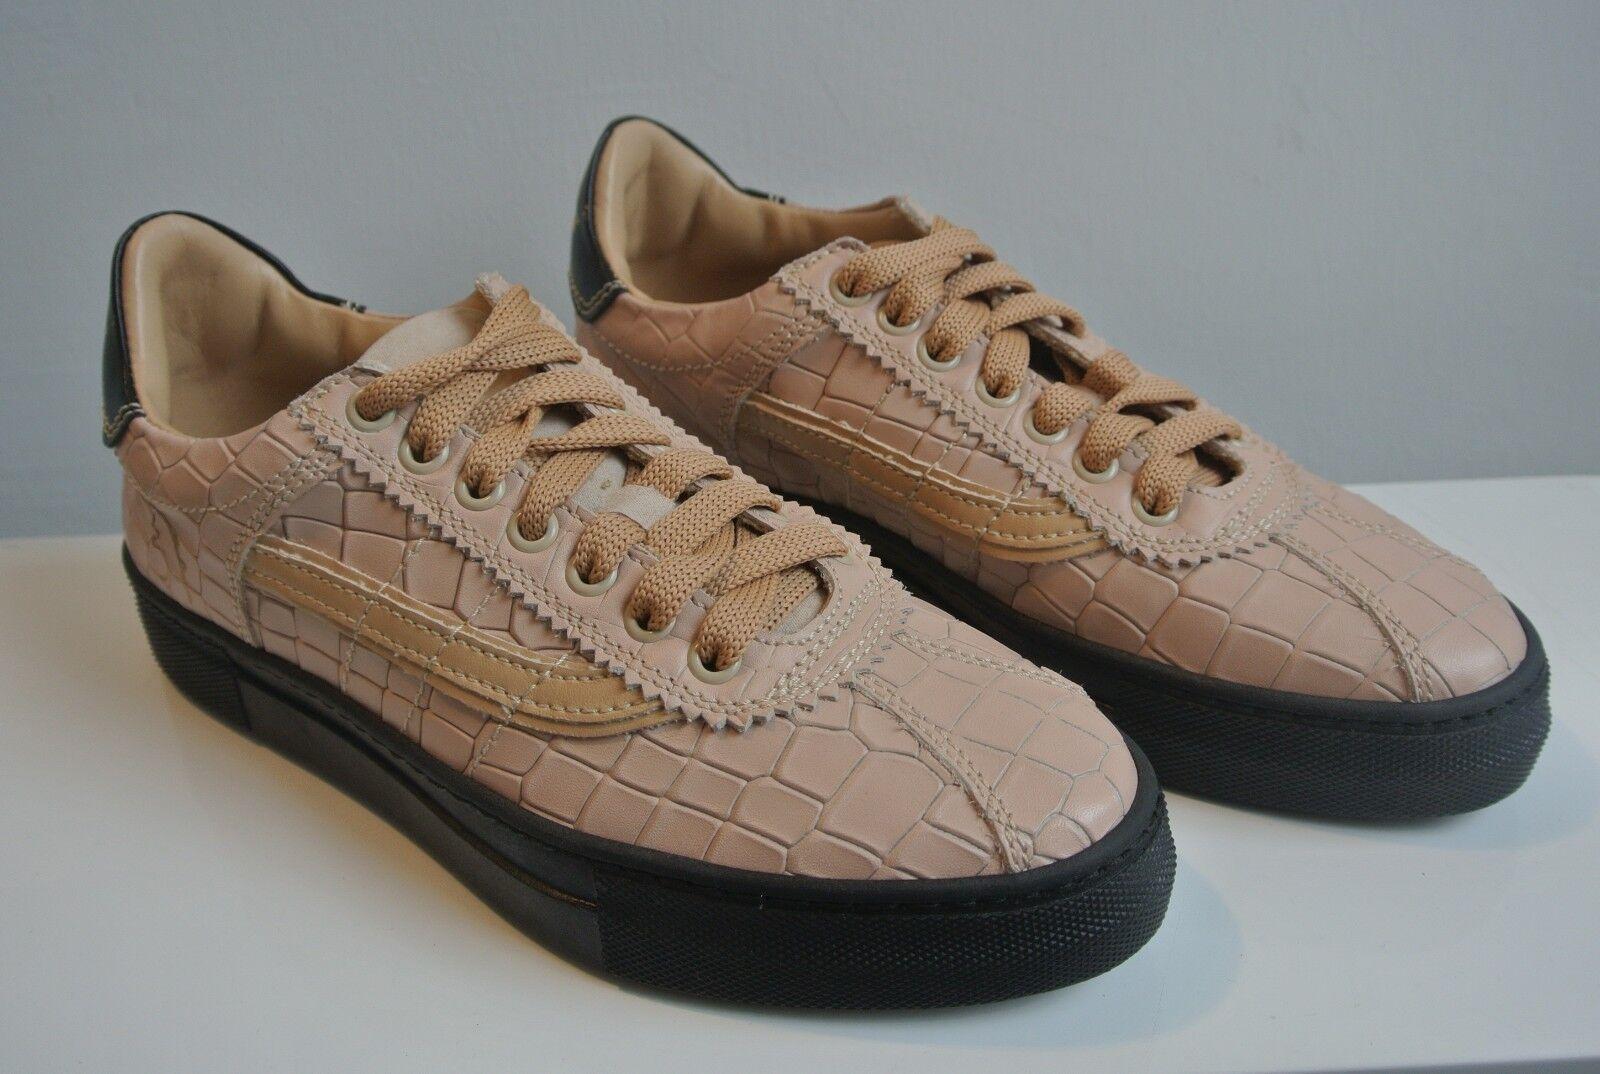 best website 5bd29 53ccb NIKE AIR MAX HYPERGUARDUP SPORT GREY-TOTAL ORANGE mens shoes SZ SZ SZ 13.5  14a9f1